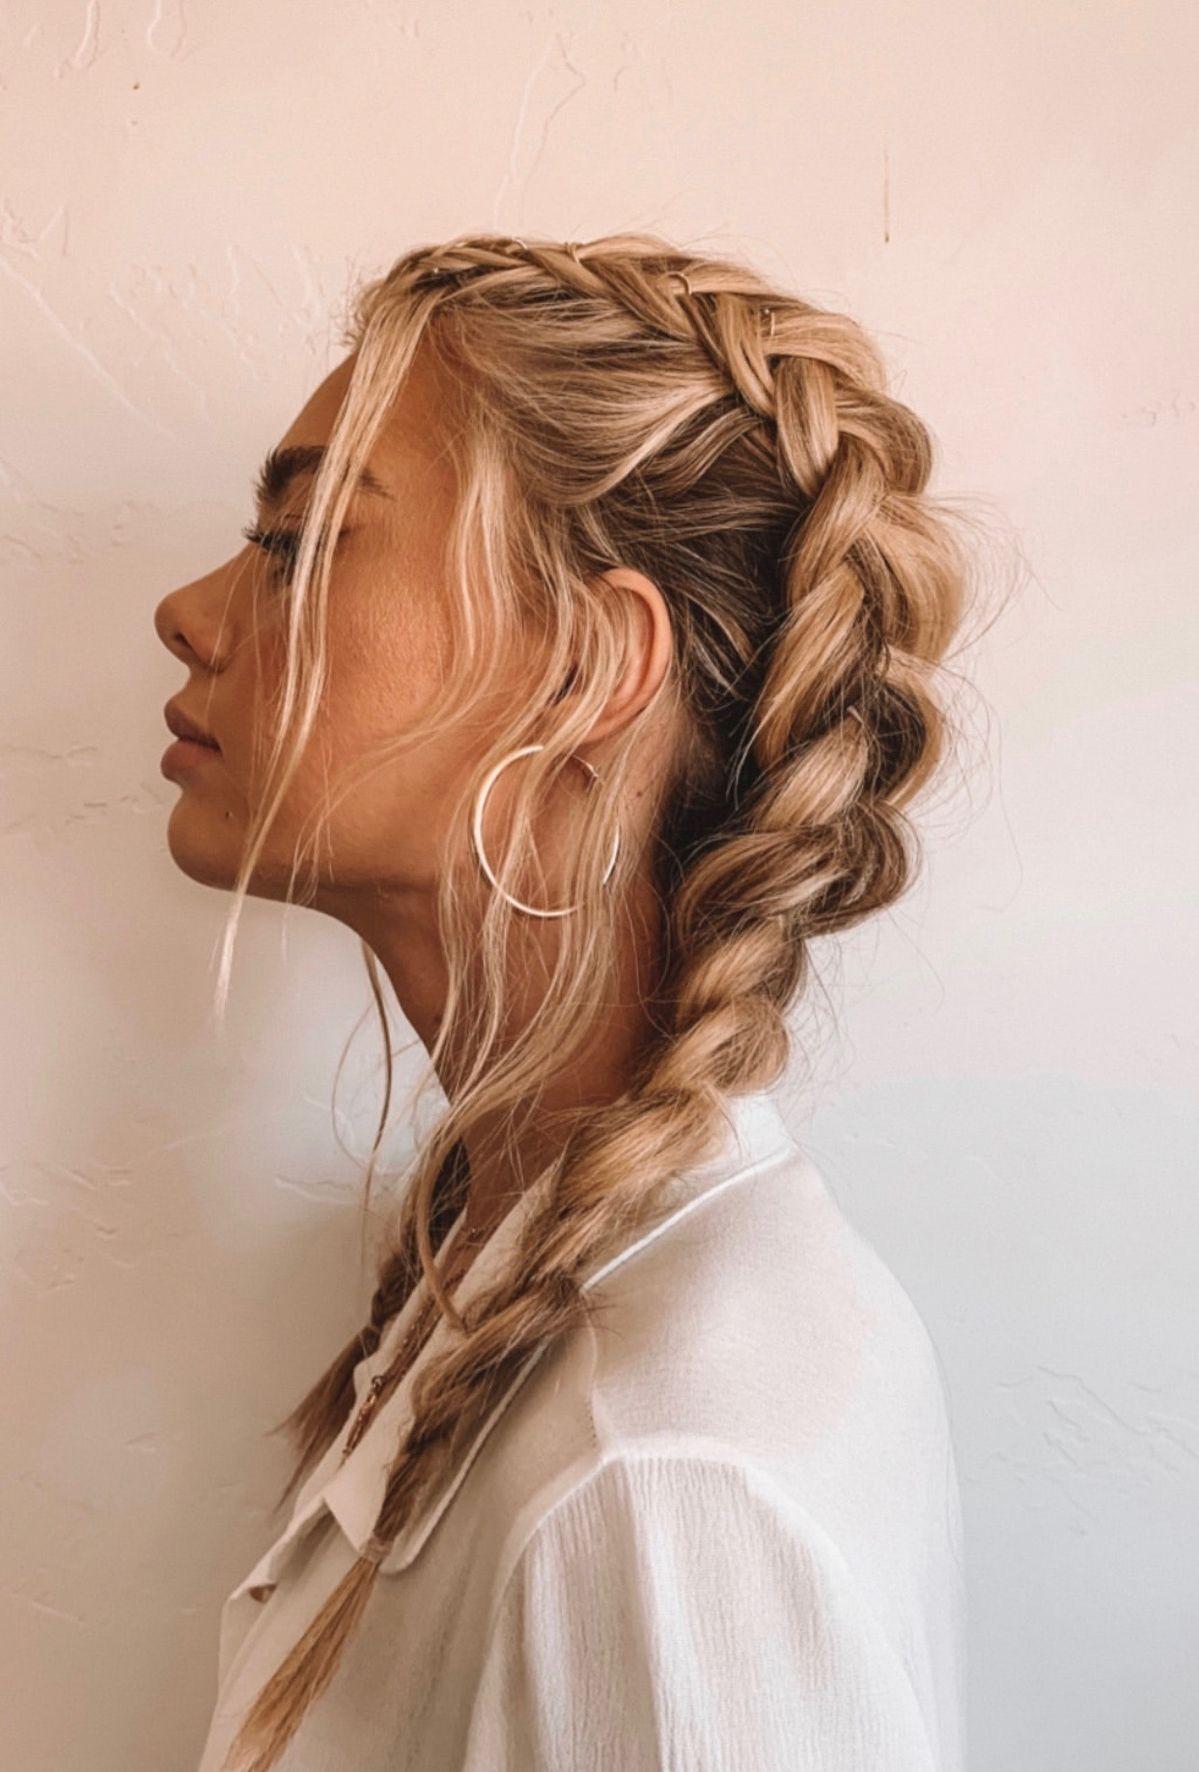 HAIR STYLES 2019-05-28 03:42:41